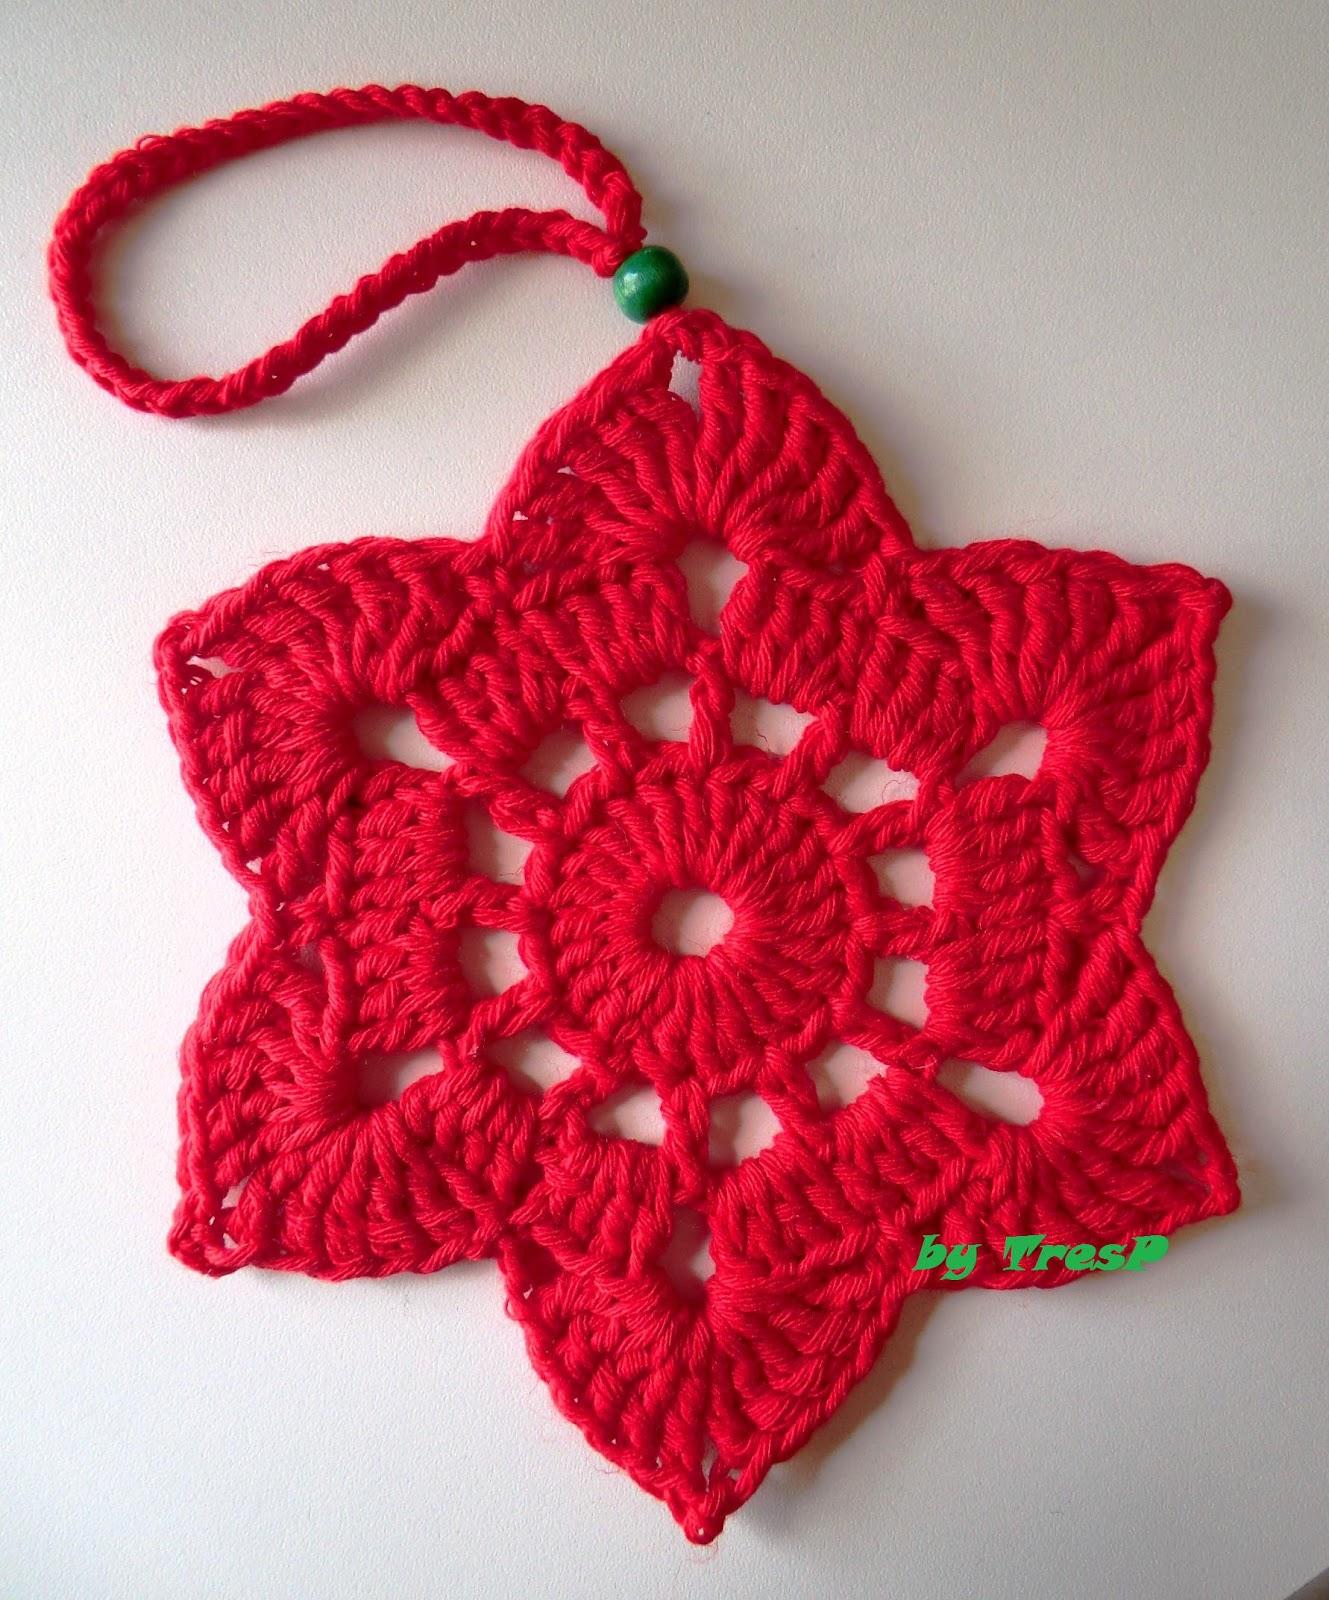 Manualidades de navidad crochet ganchillo pinterest - Detalles de ganchillo para regalar ...